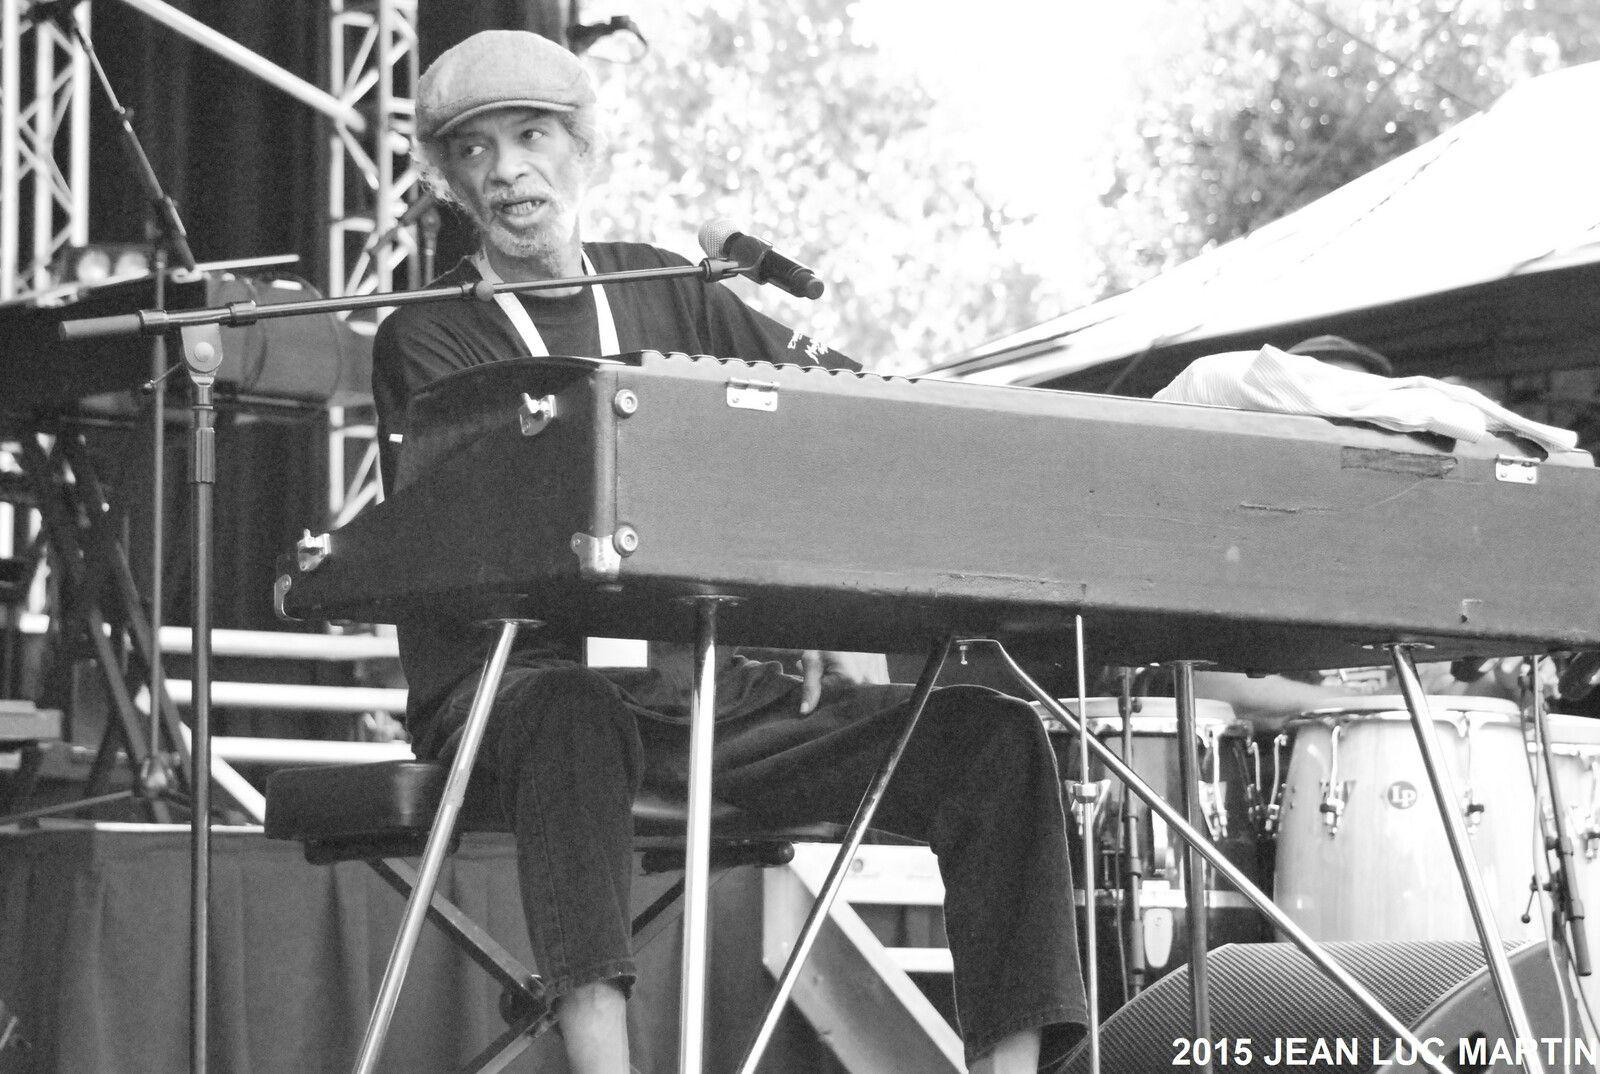 GIL SCOTT-HERON: 10 ANS QUE CE GRAND SONG-WRITER NOUS A QUITTE...